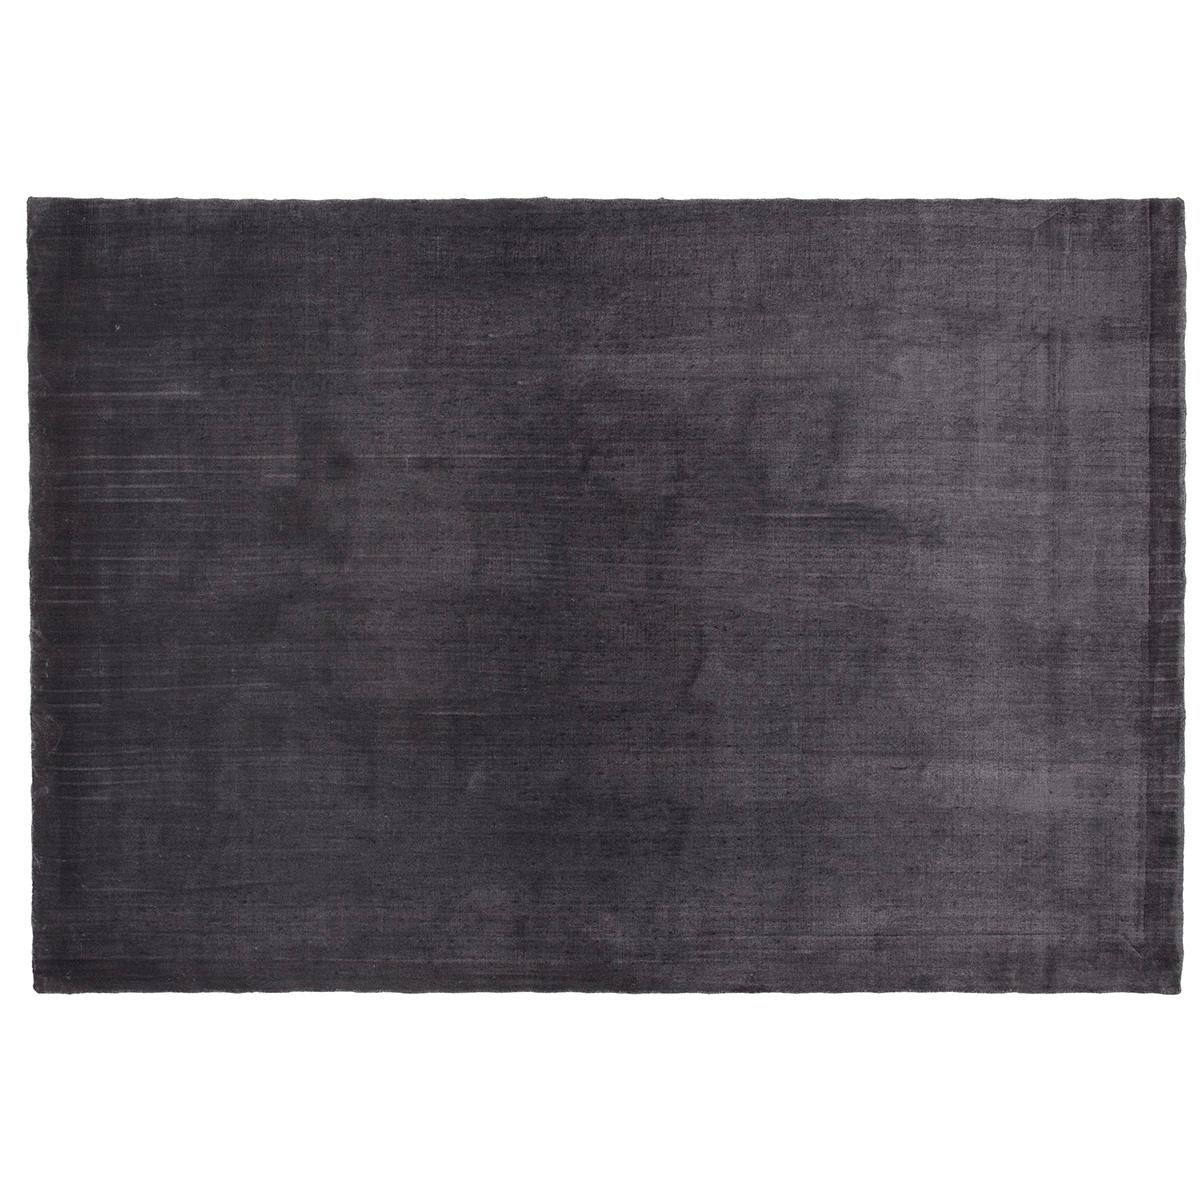 Vloerkleed Brinker Sensation Antik | 200 x 290 cm